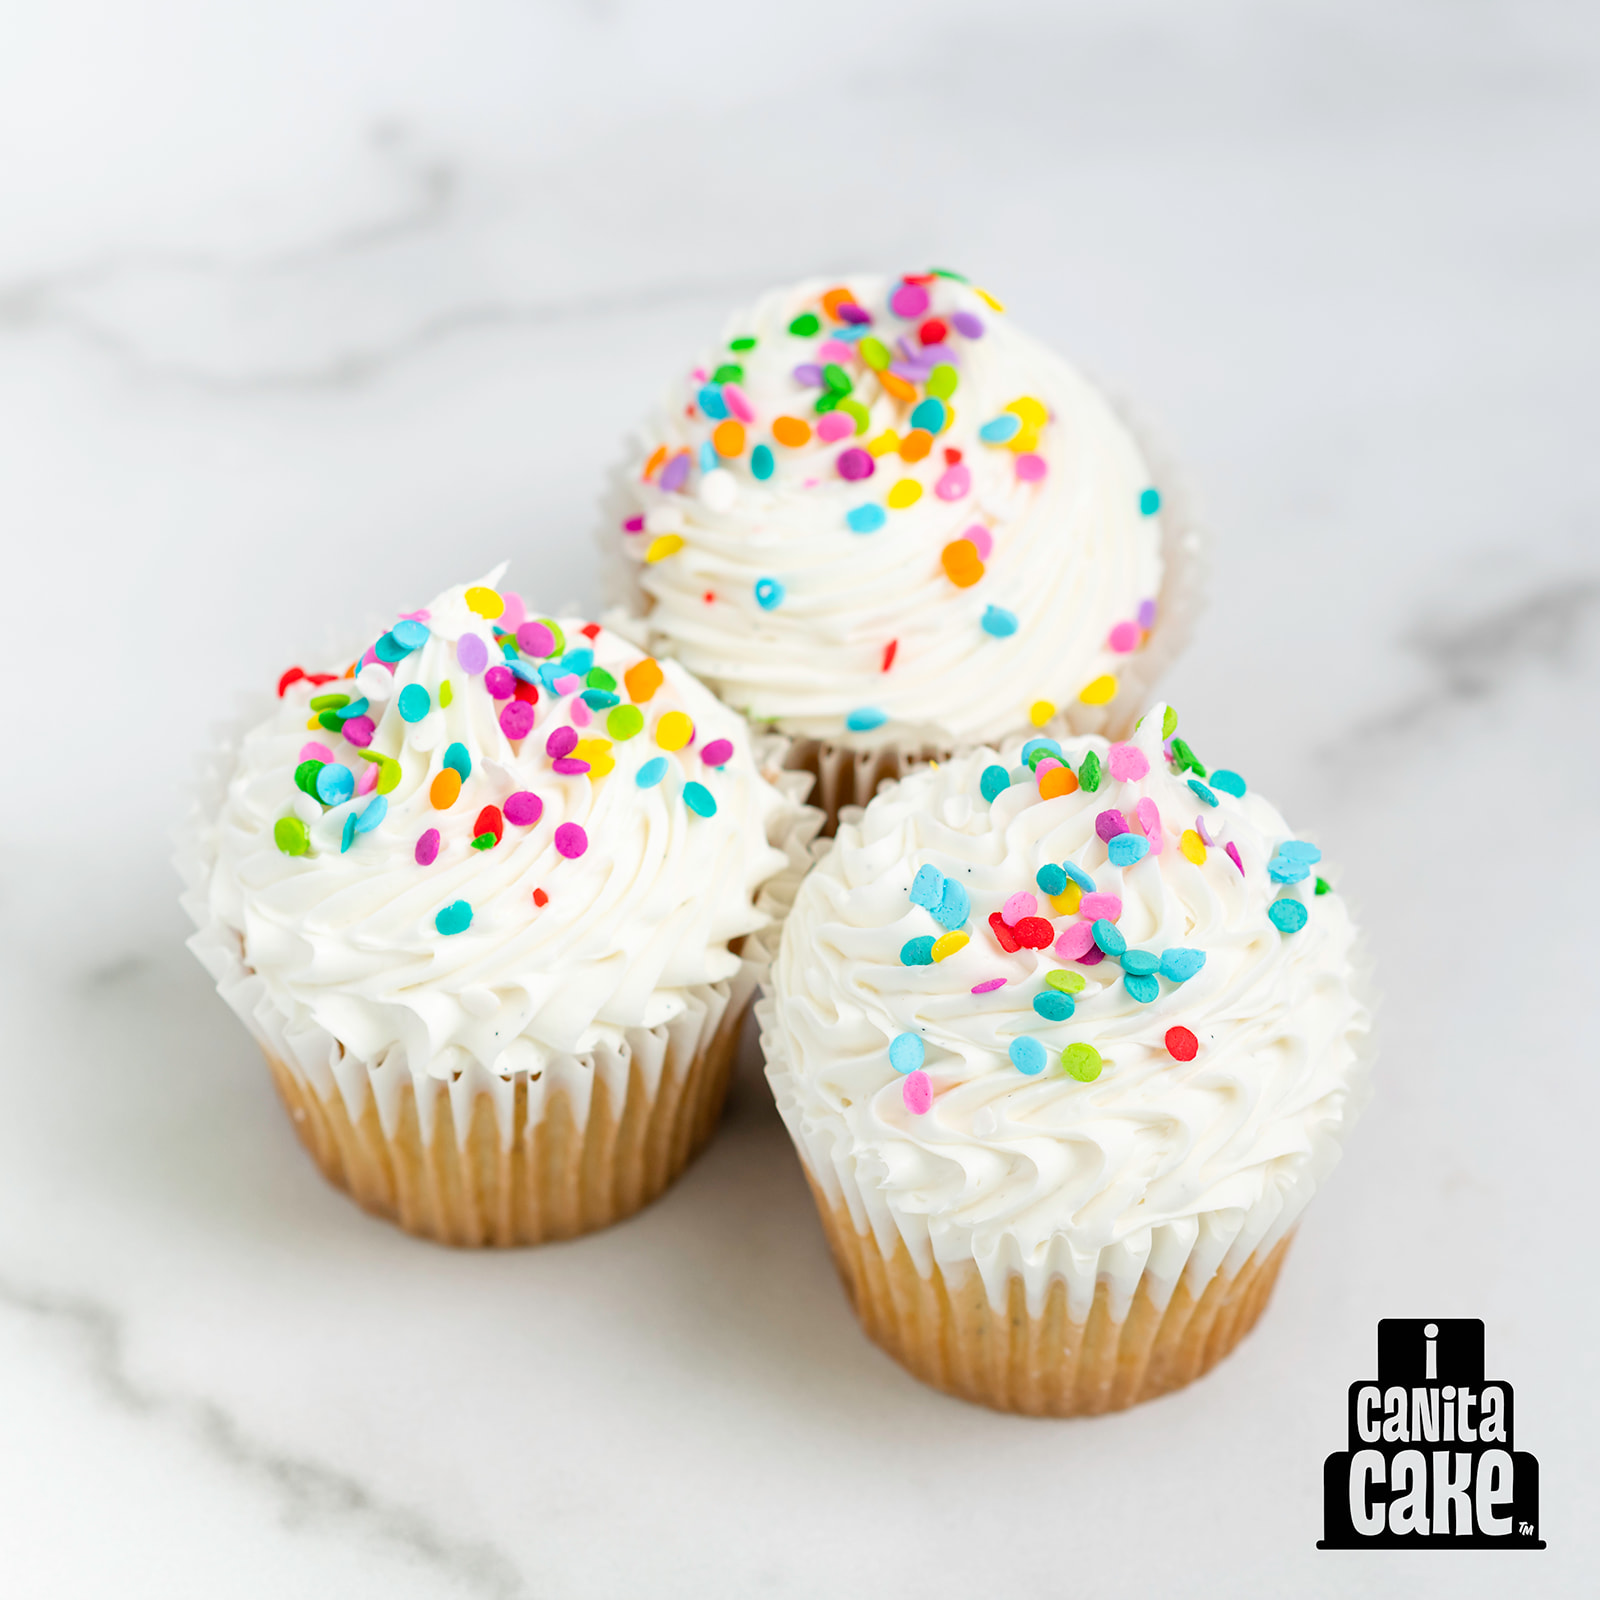 Vanilla Bean Cupcakes by I Canita Cake